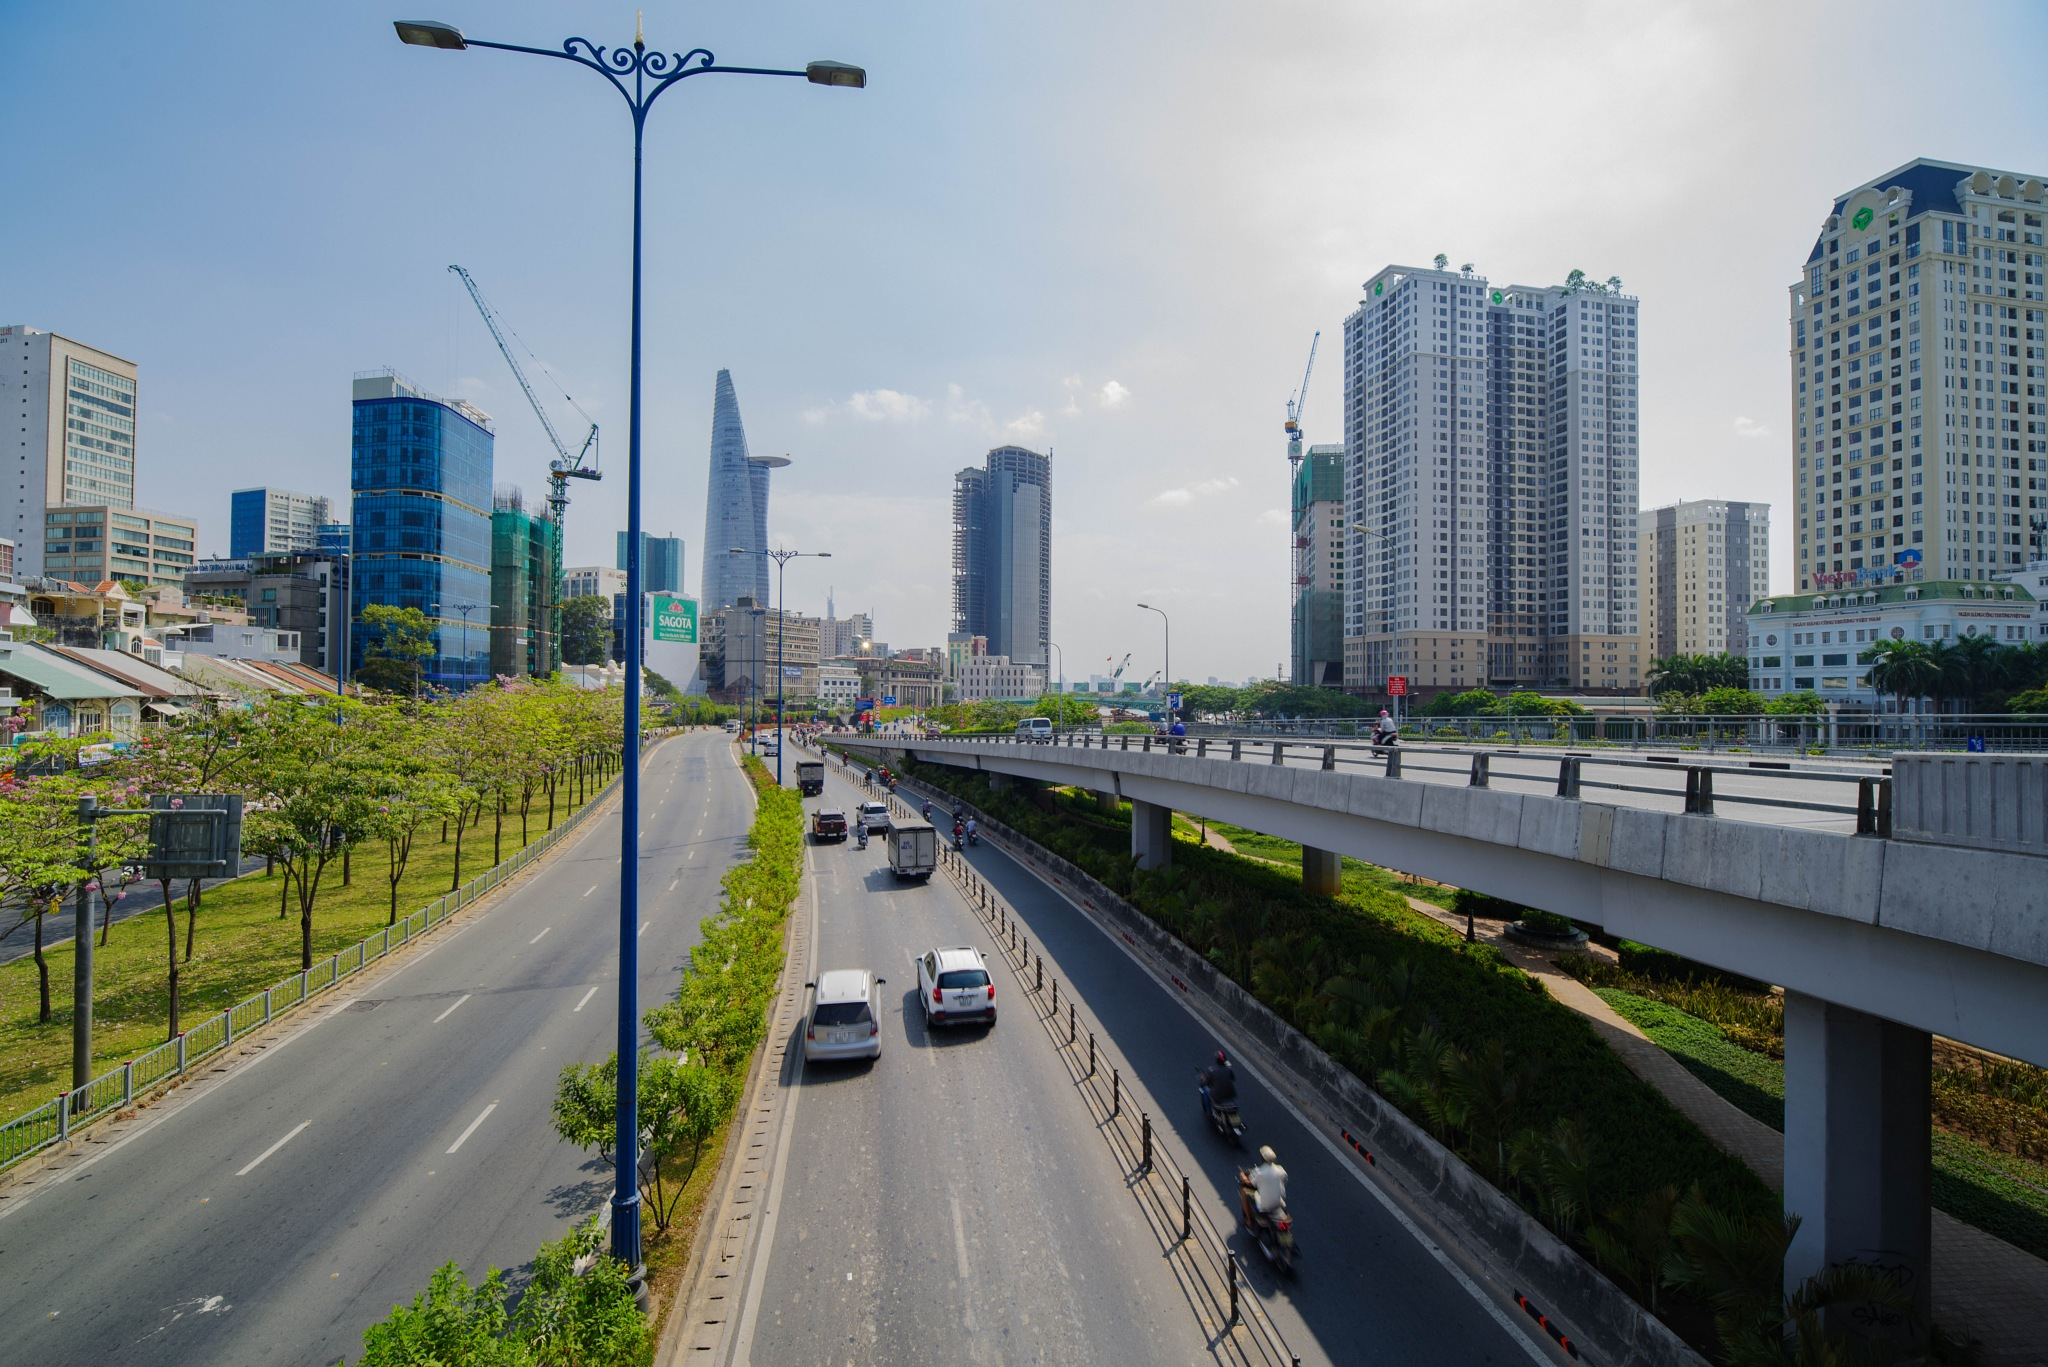 Saigon highway by Huy Nguyen Quang